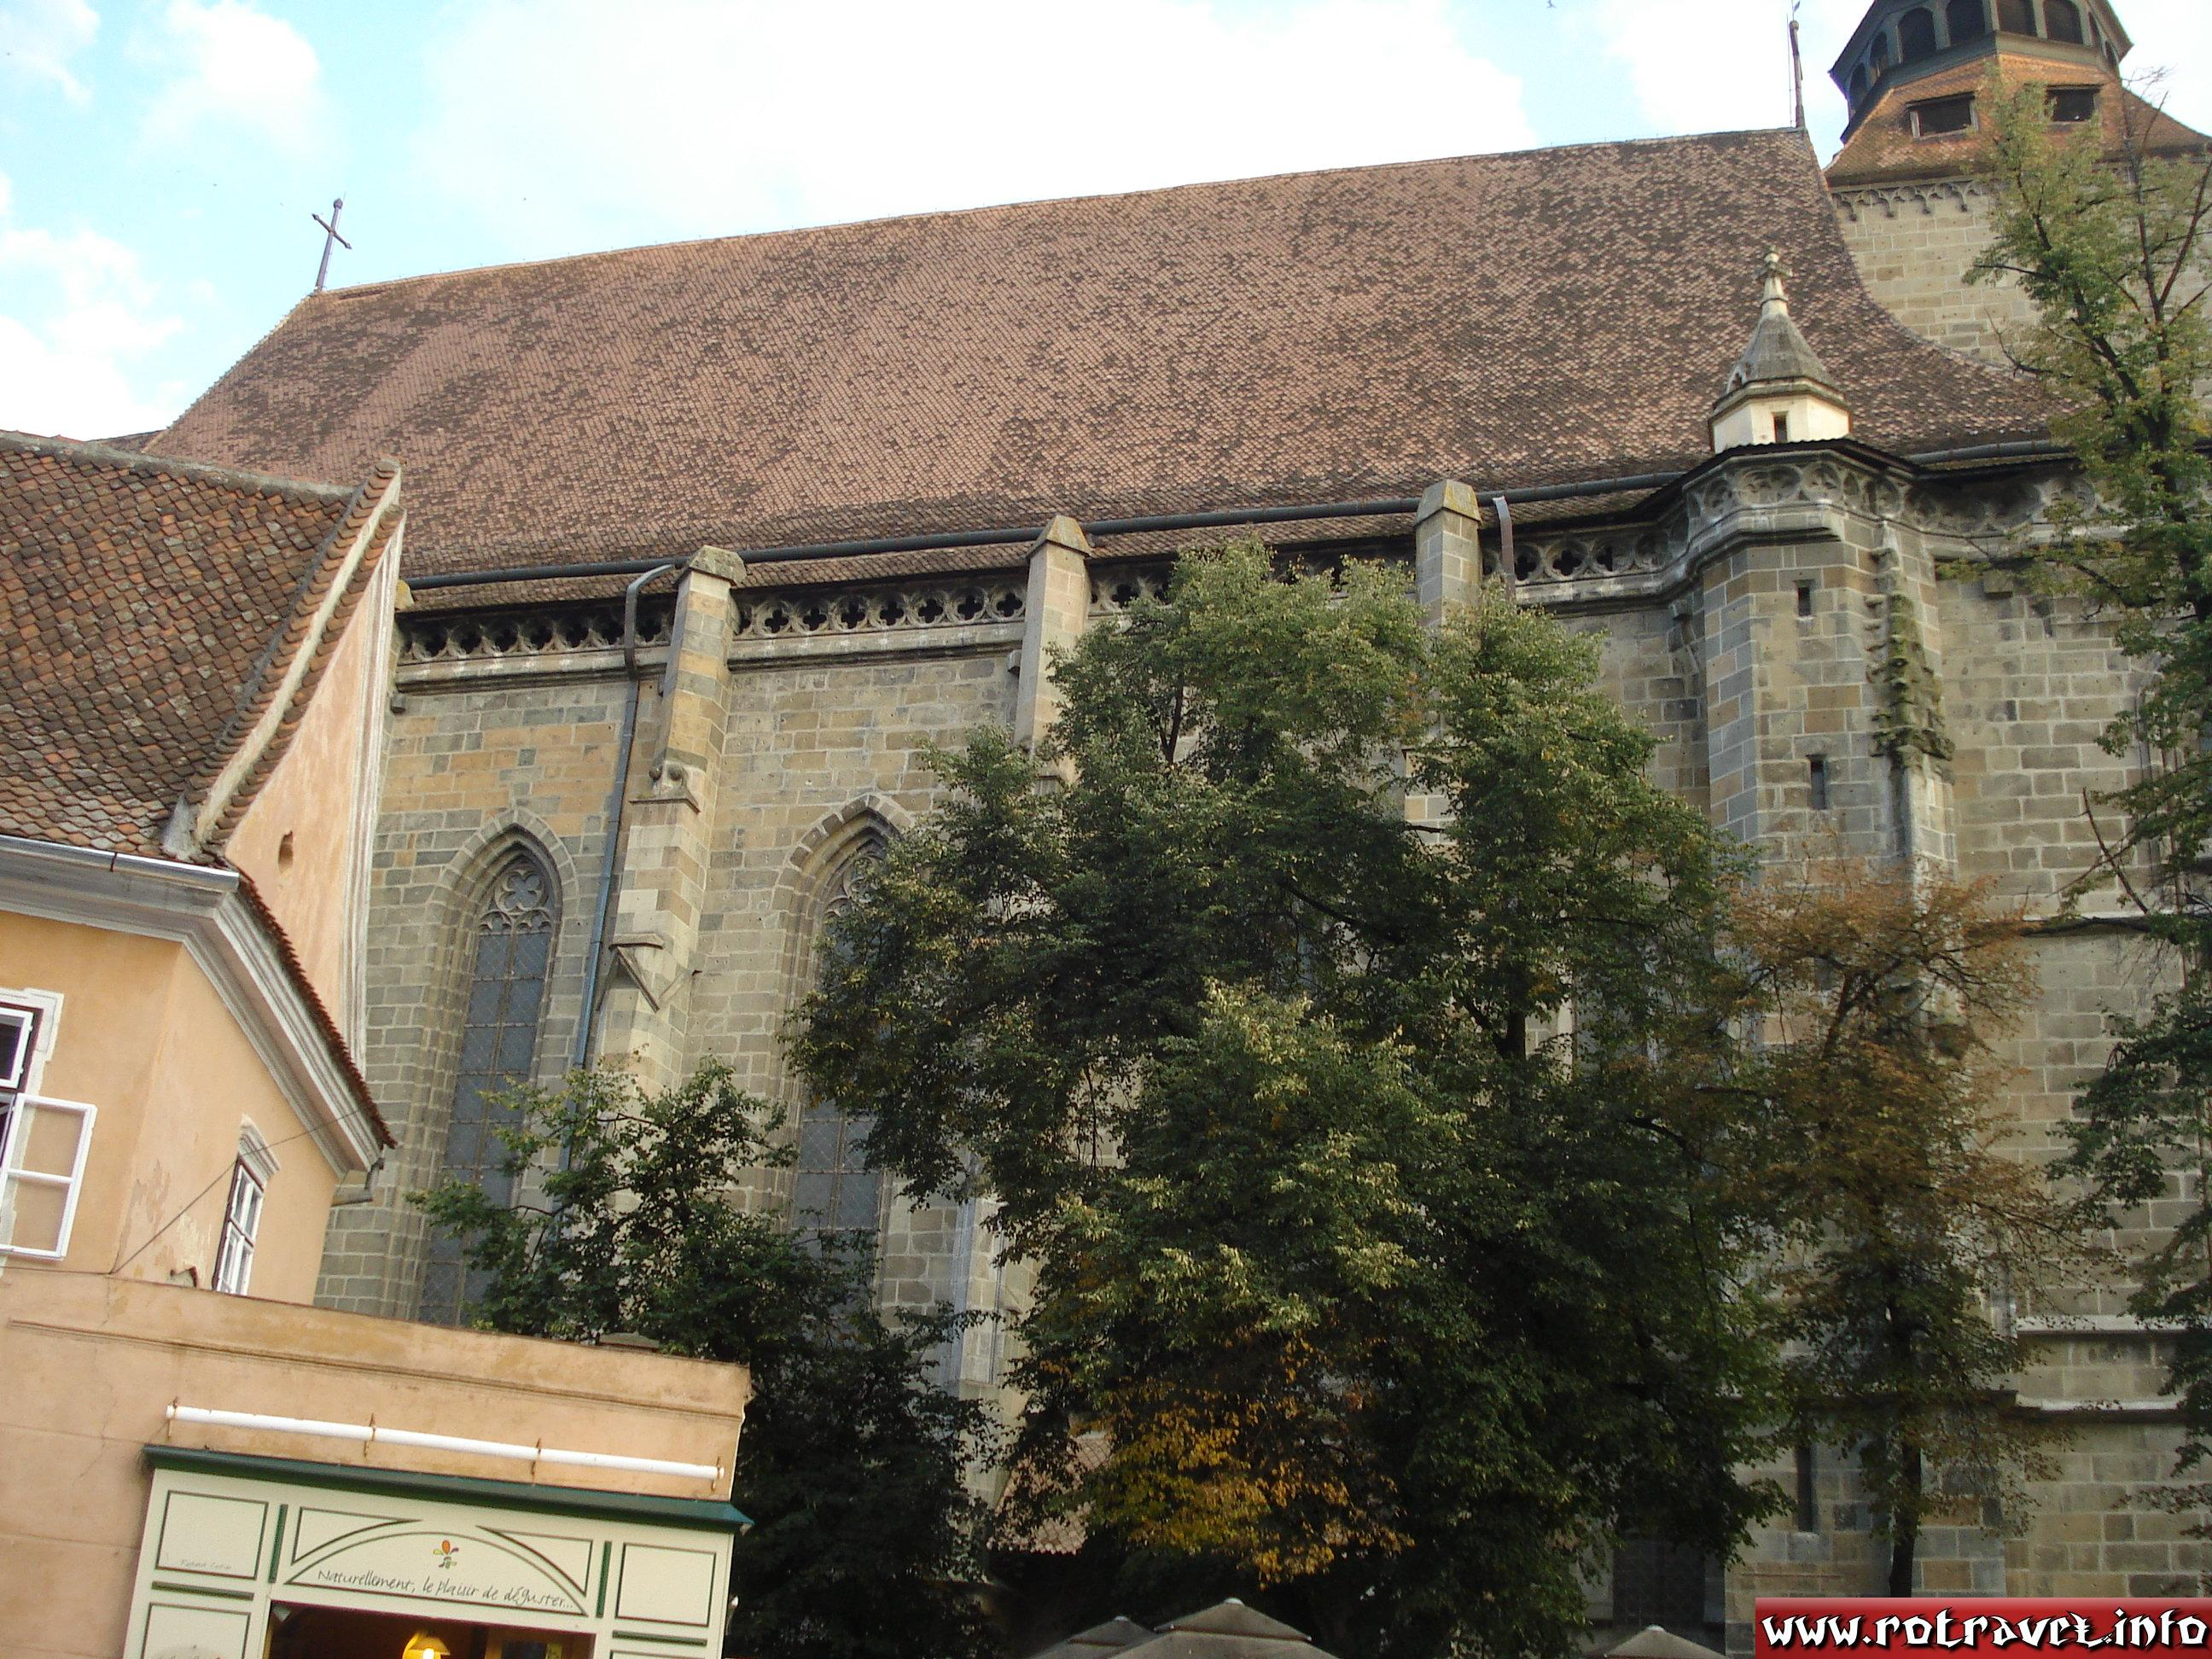 Biserica Neagră or Black Church (German: Schwarze Kirche; Romanian: Biserica Neagră; Hungarian: Fekete templom)